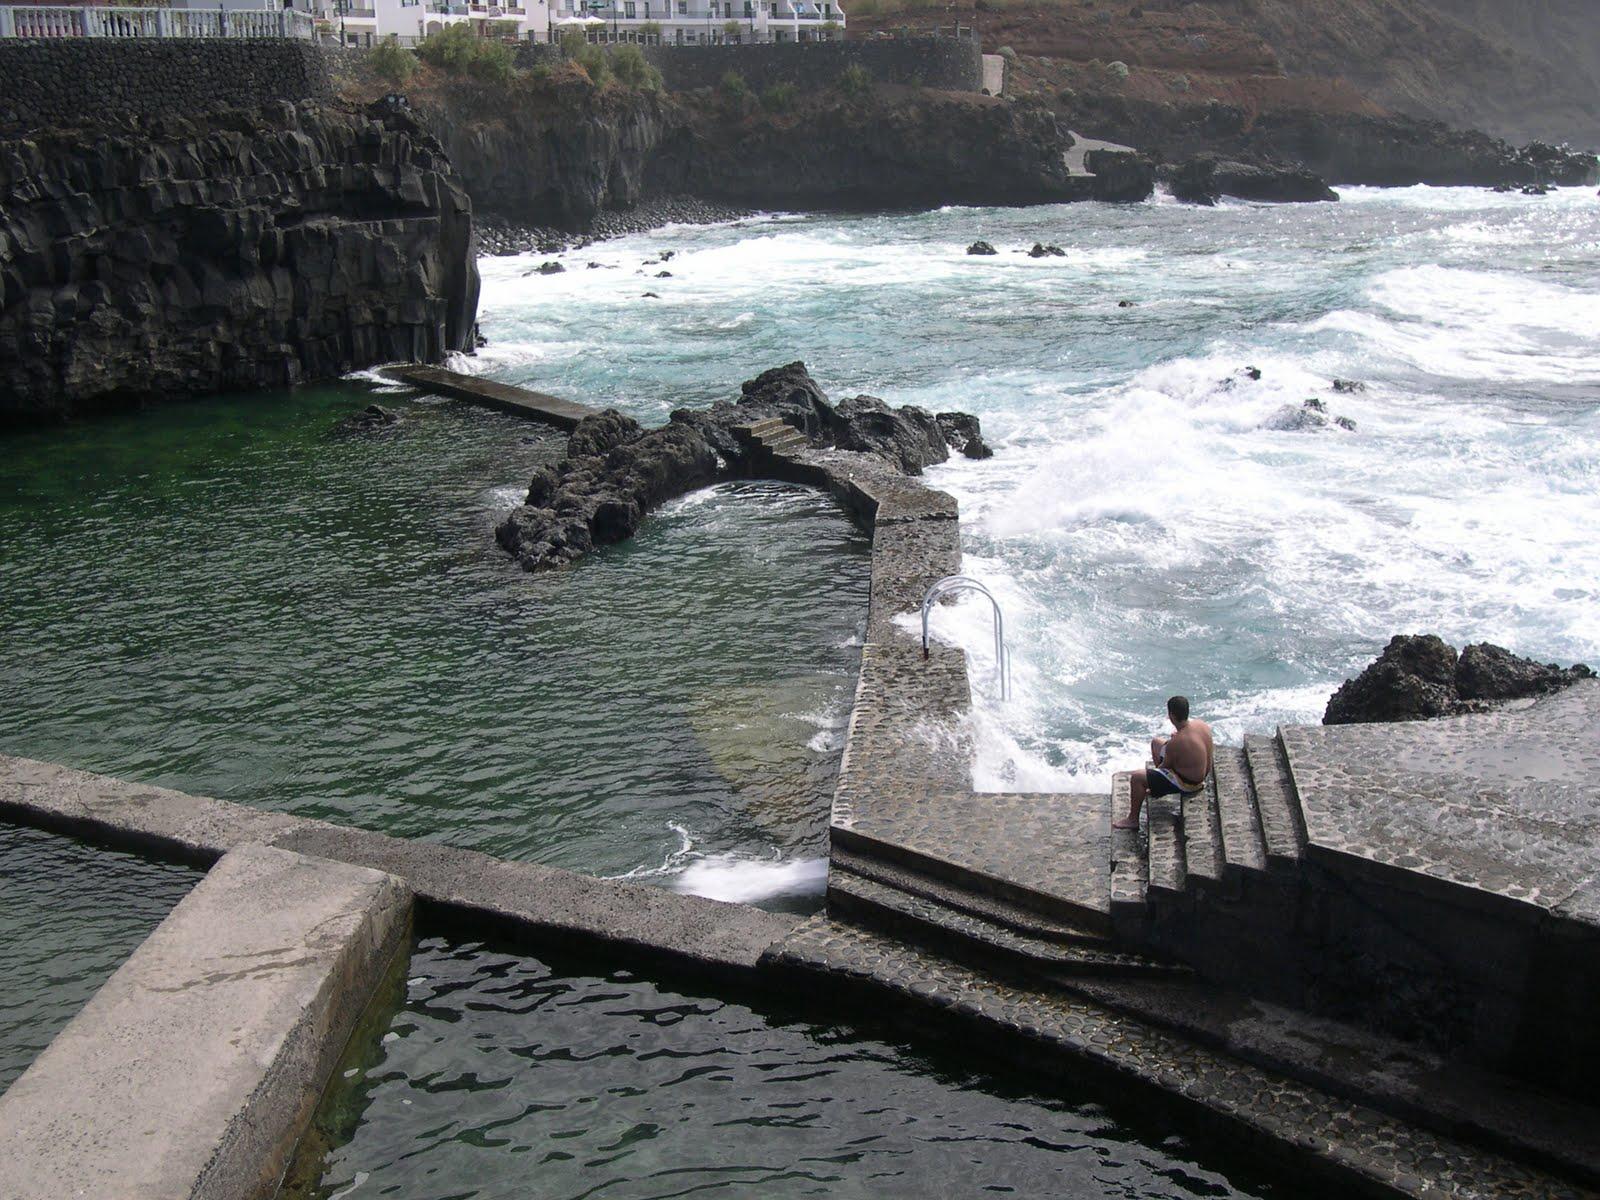 Alain lasa piscinas naturales de la fajana for La pedriza piscinas naturales